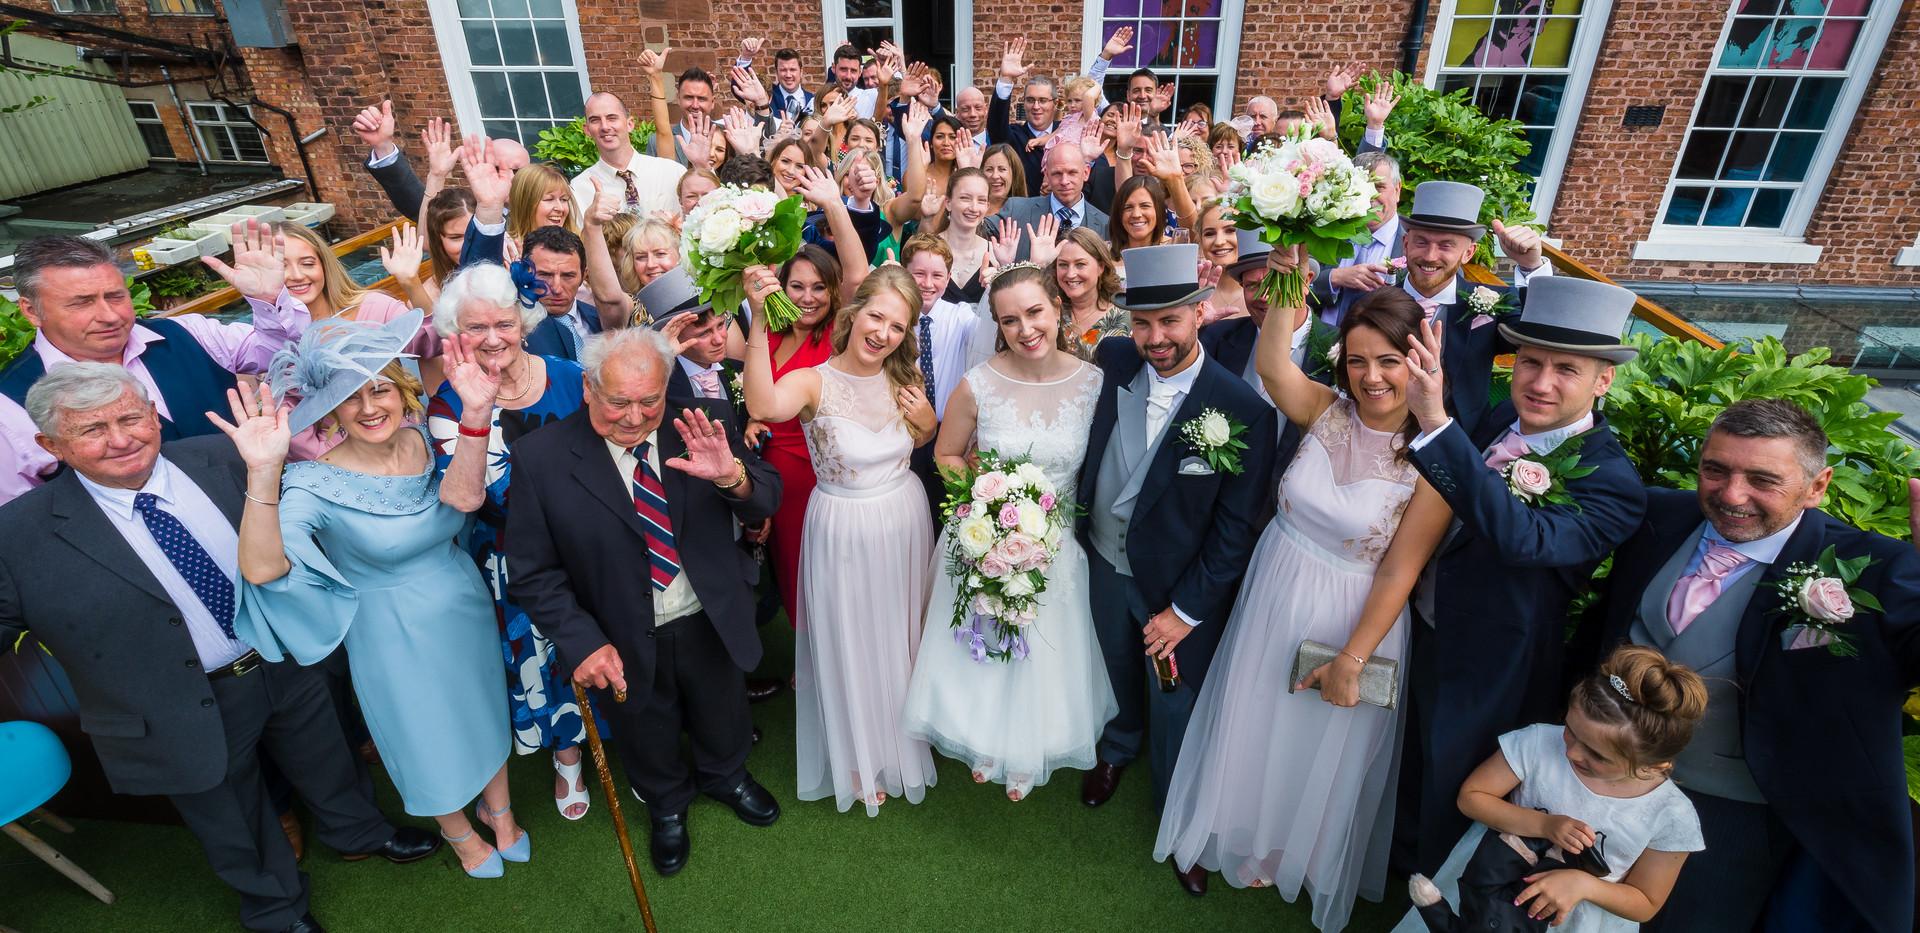 Oddfellows Wedding Photography___11.jpg